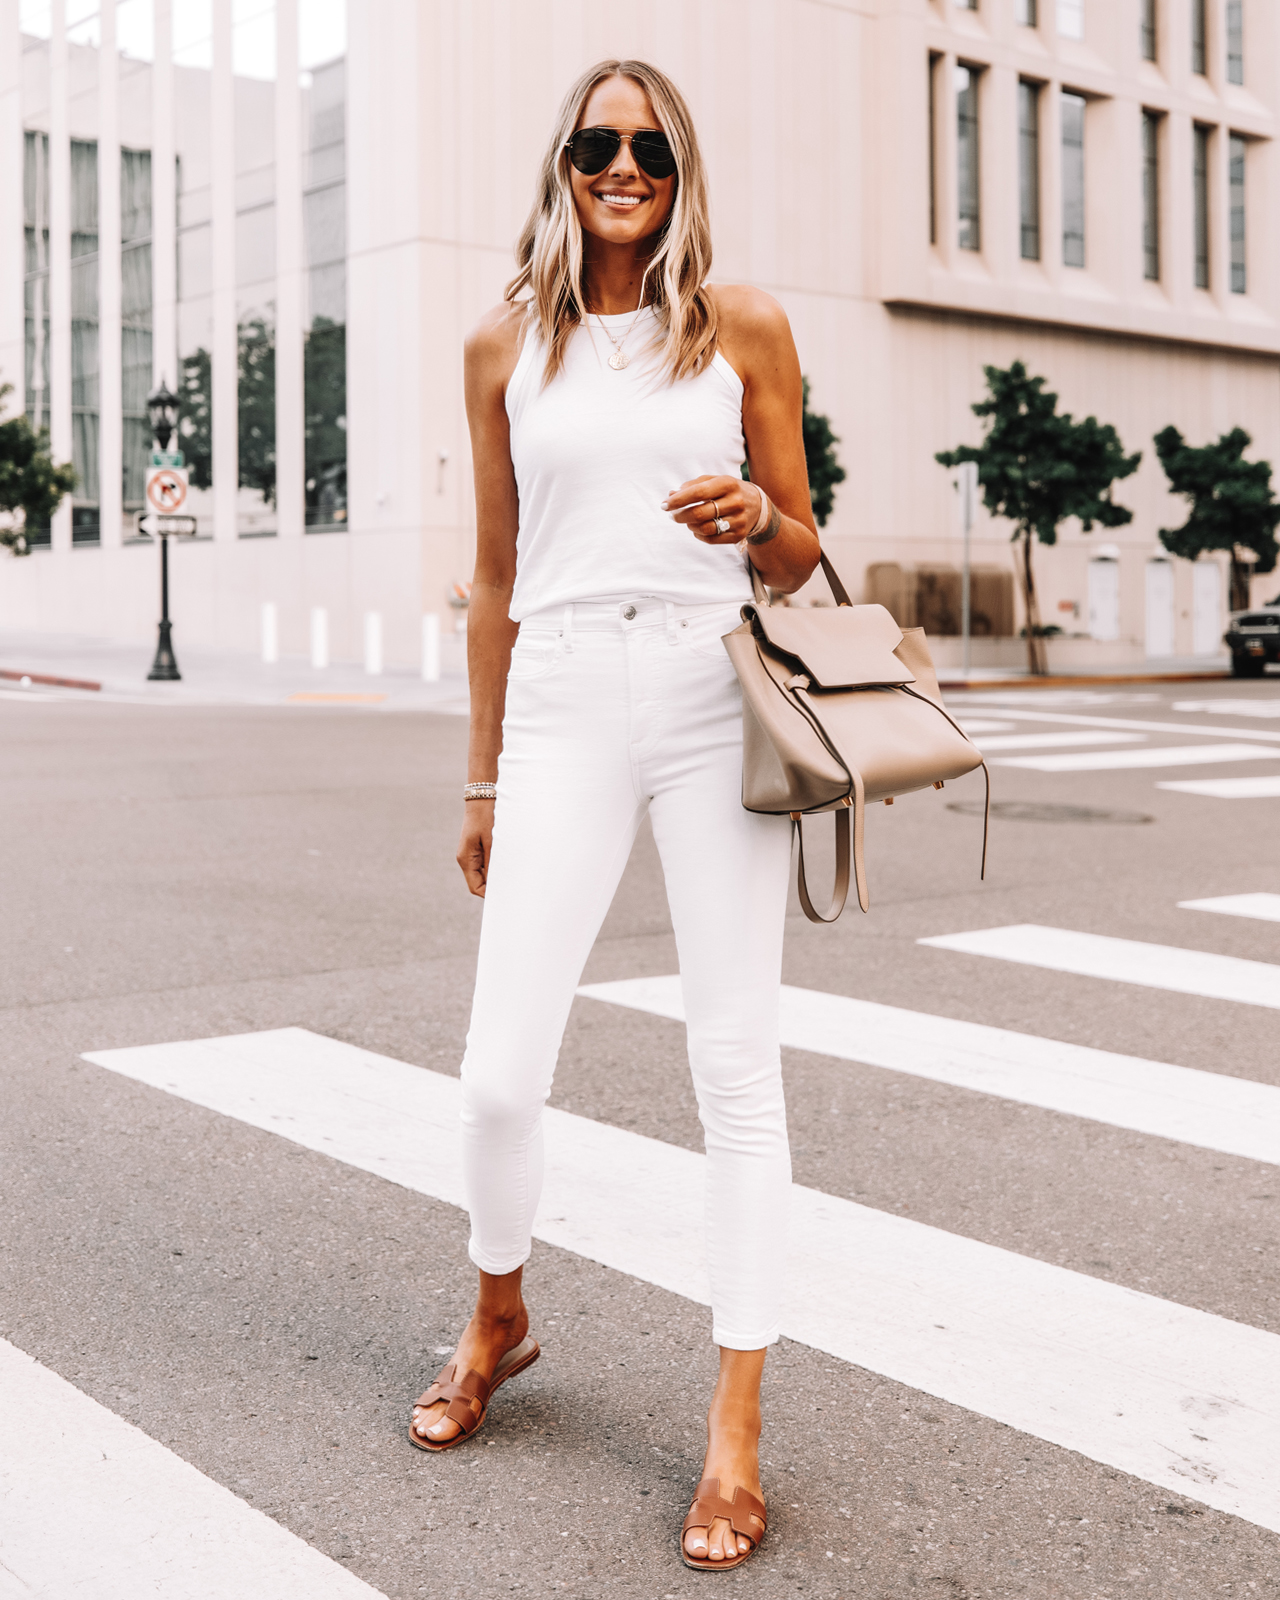 Fashion Jackson Wearing Everlane White Tank Everlane White Skinny Jeans Hermes Sandals